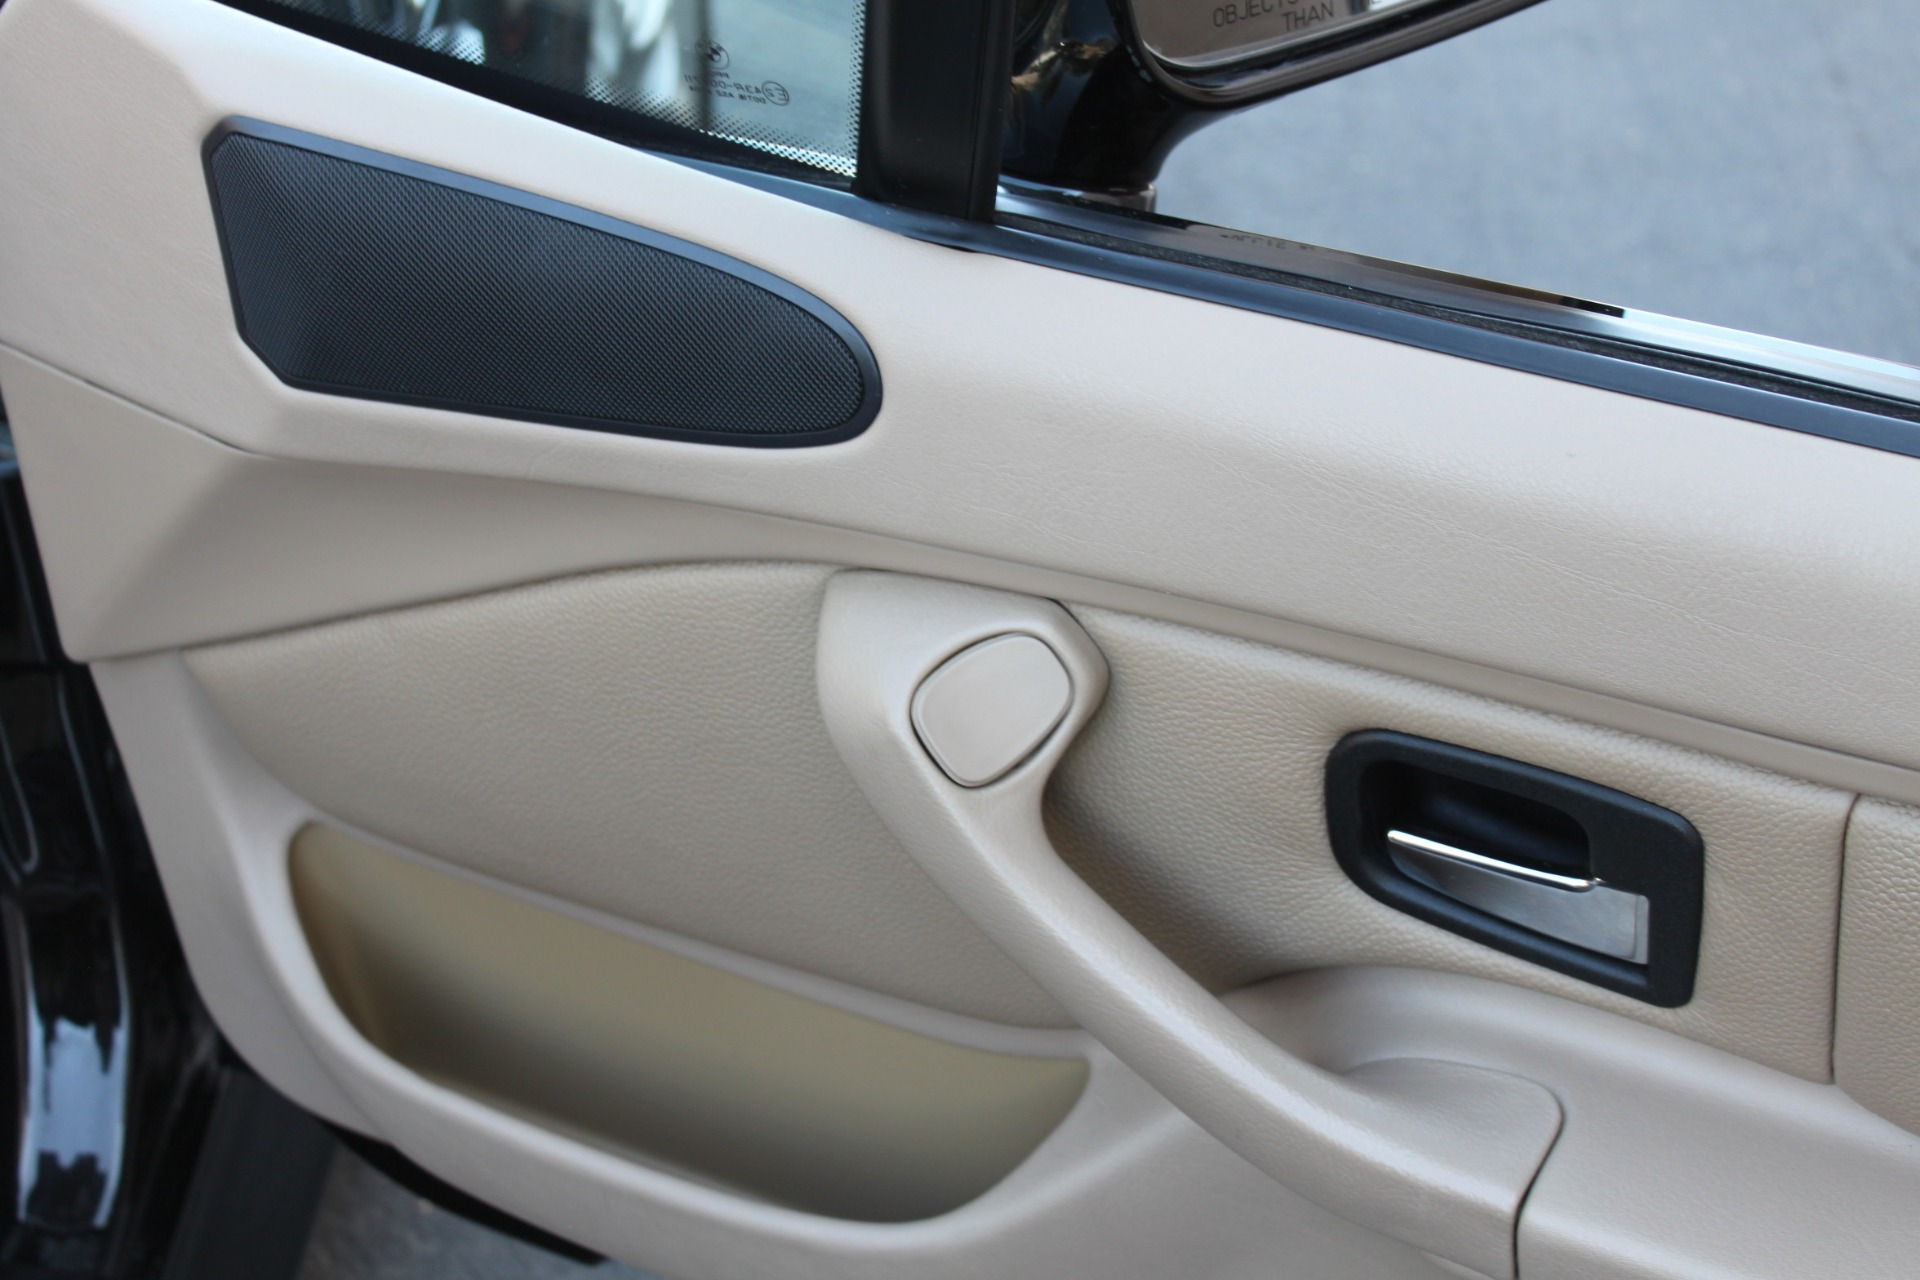 Used-2001-BMW-Z3-Roadster-30i-New-use-car-dealer-IL